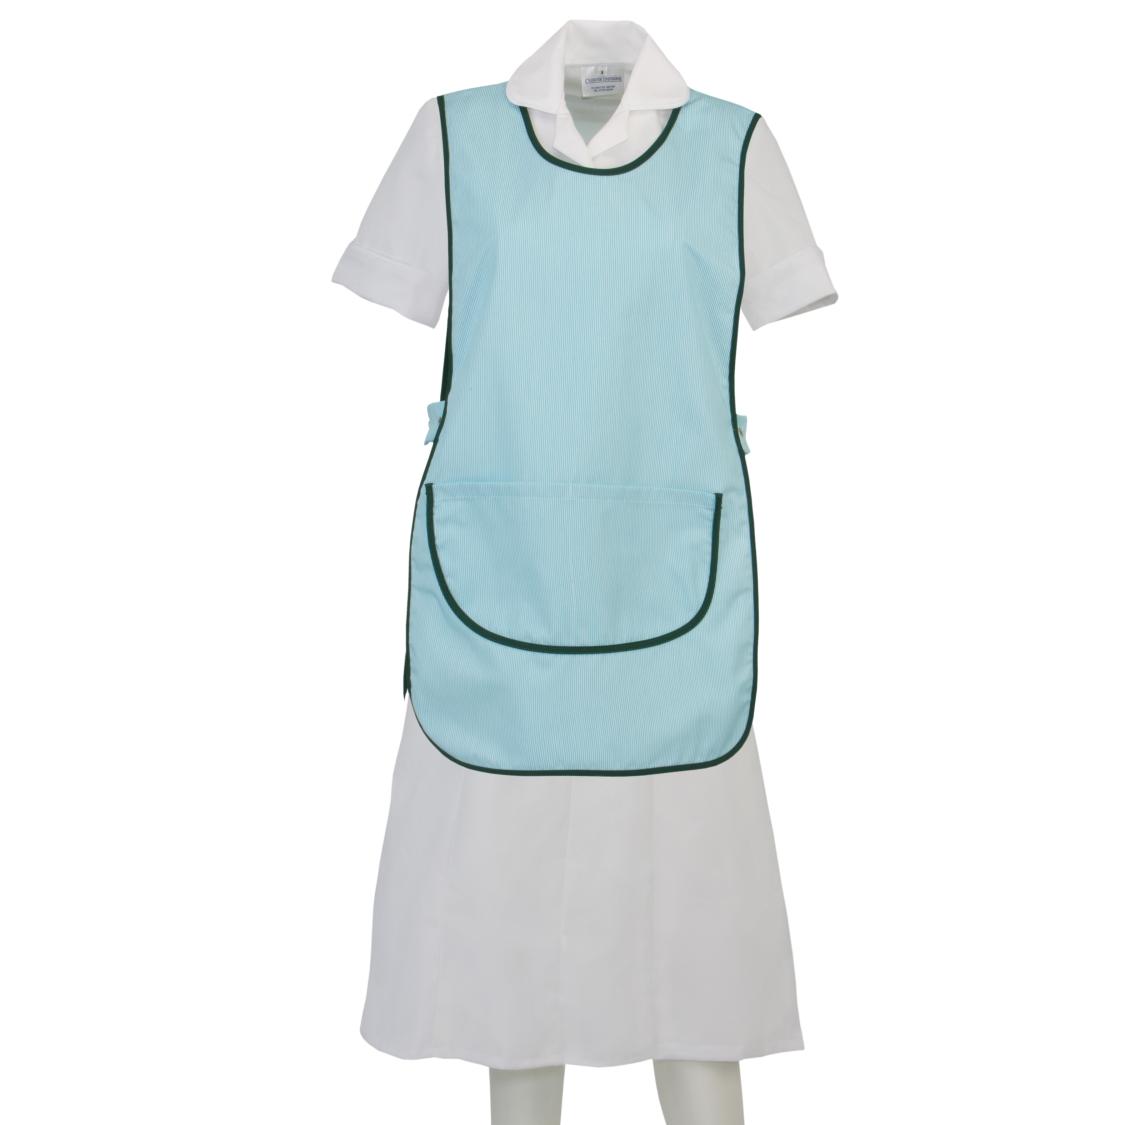 White tabard apron - Ct1 Stripe Tabards